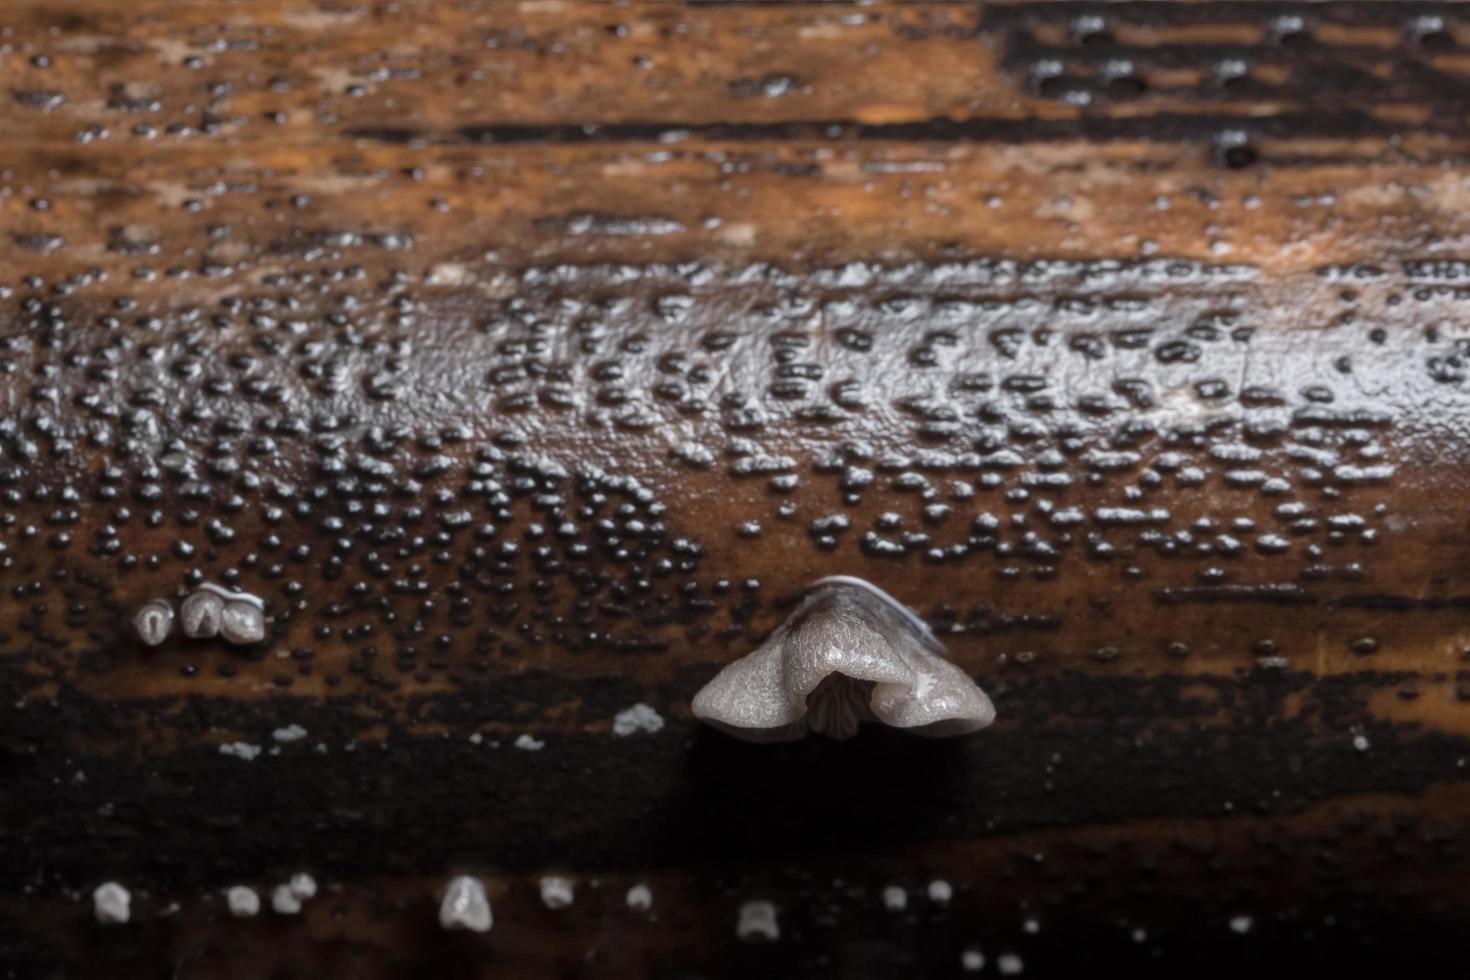 White fungus close-up photo